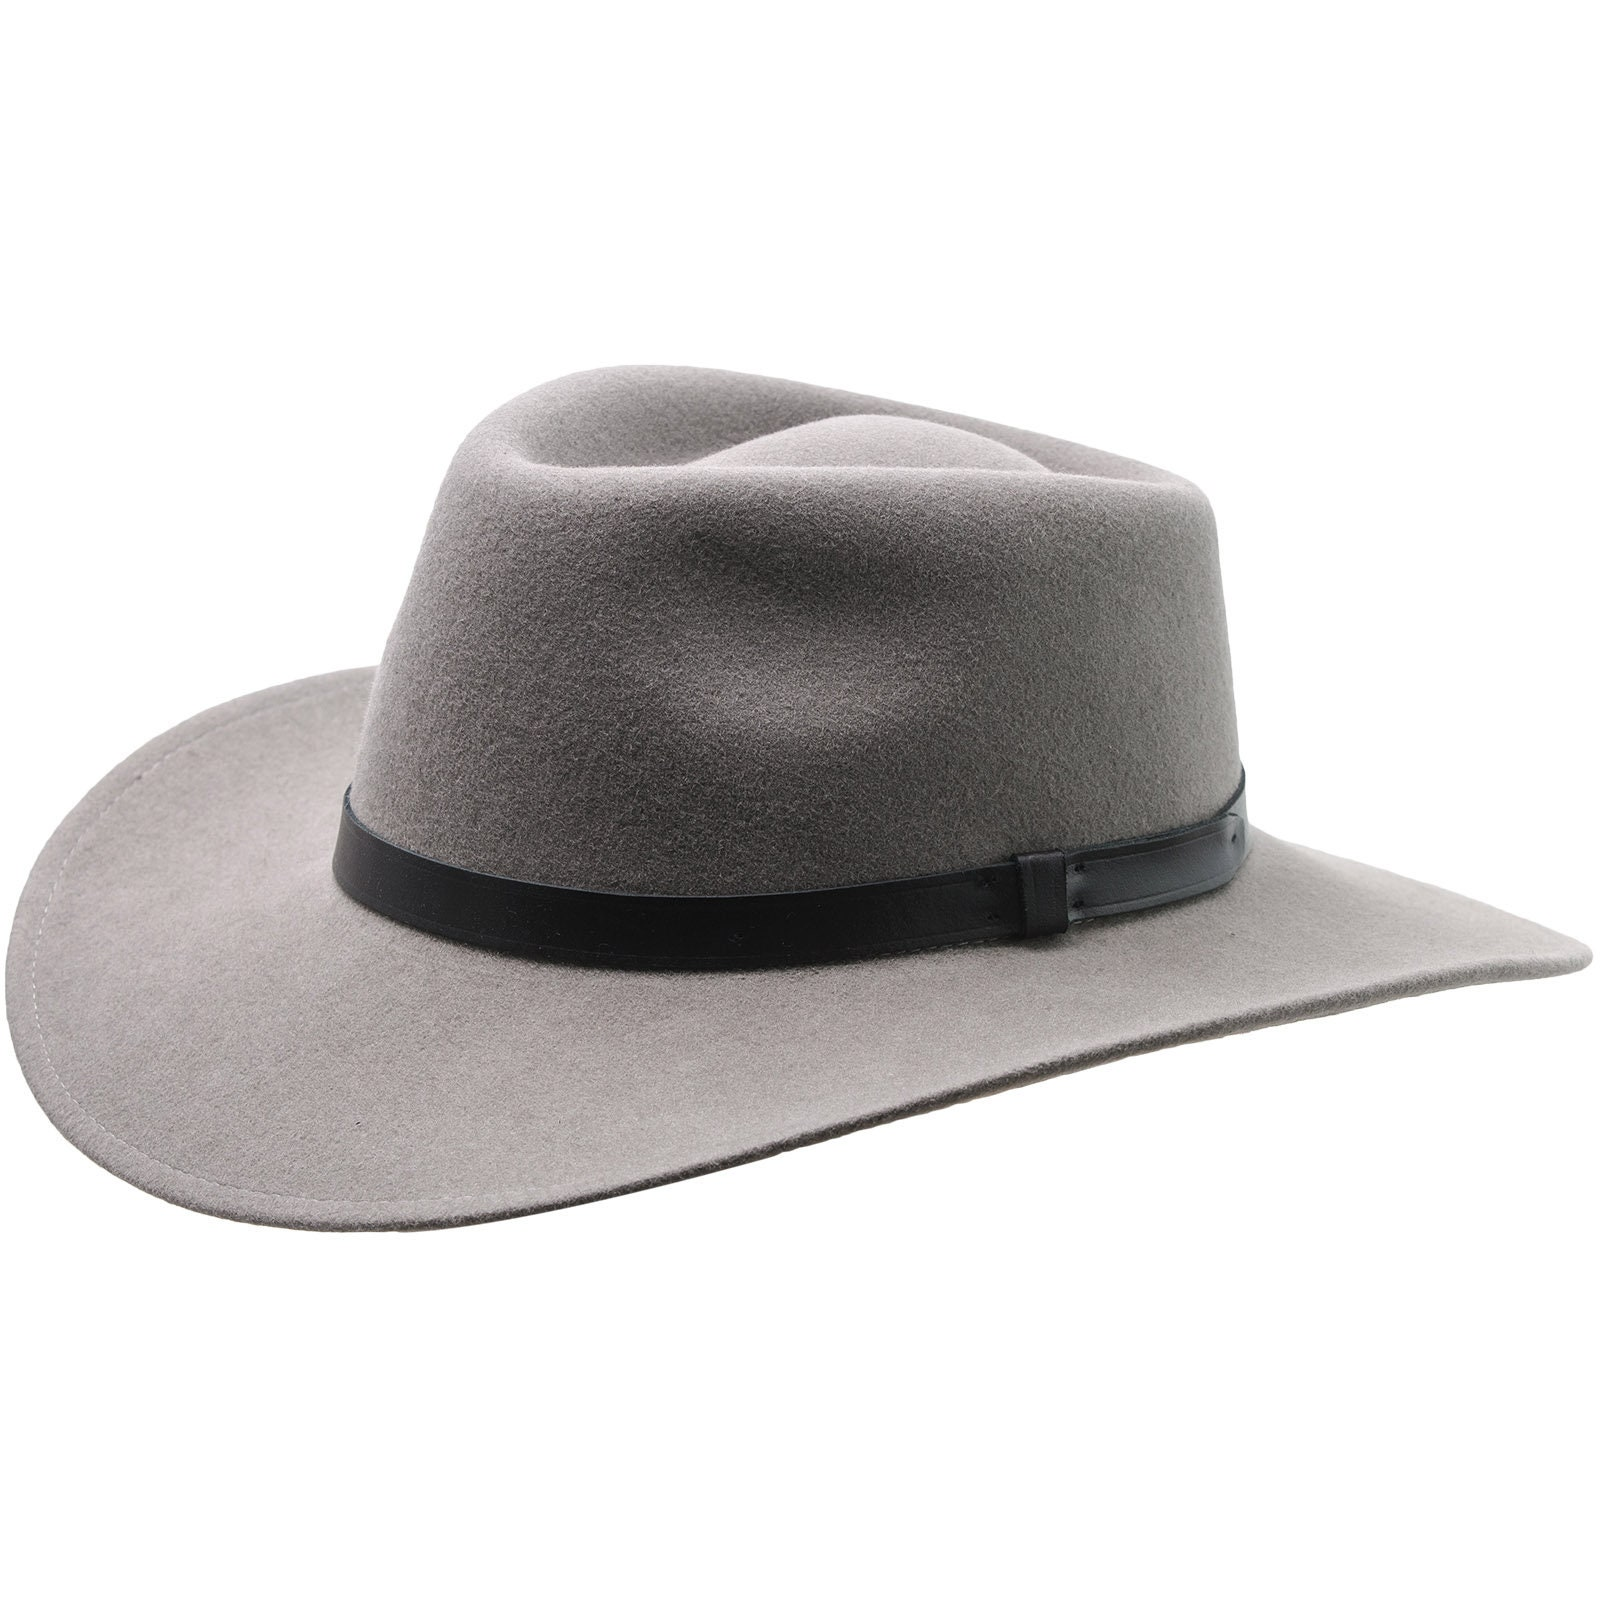 9e08dc79b SHARPS Wool Felt Teardrop Top Large Brim Fedora Hat Classic Jazz Vintage  Boho Mobster Gangster Dressy Trilby Cowboy Western Wide Big Brim